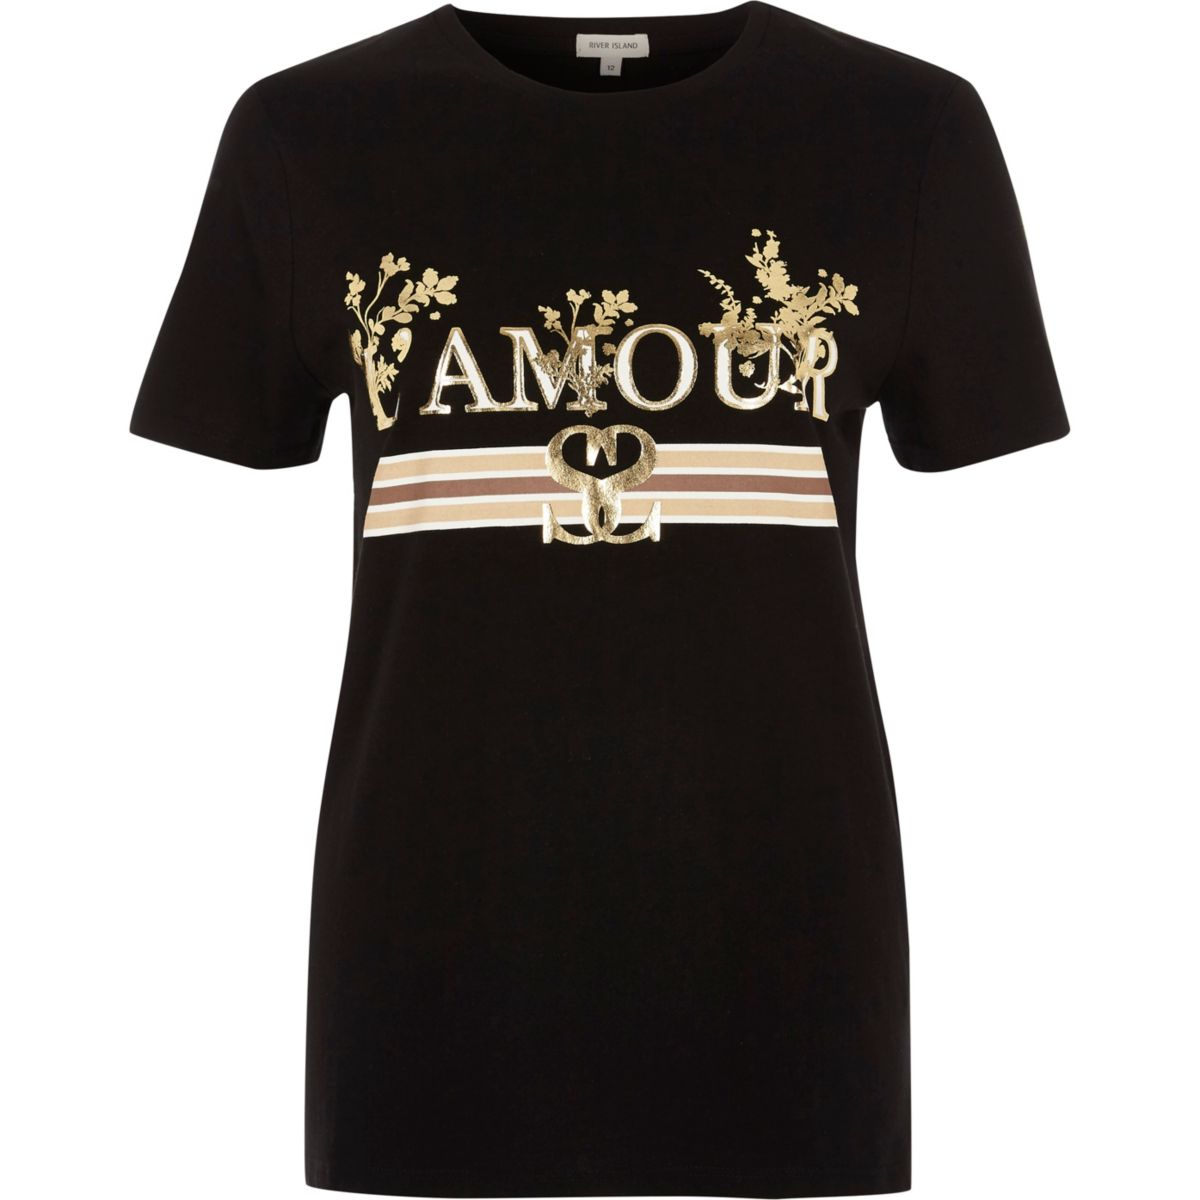 Black 'l'amour' foil metallic print T-shirt